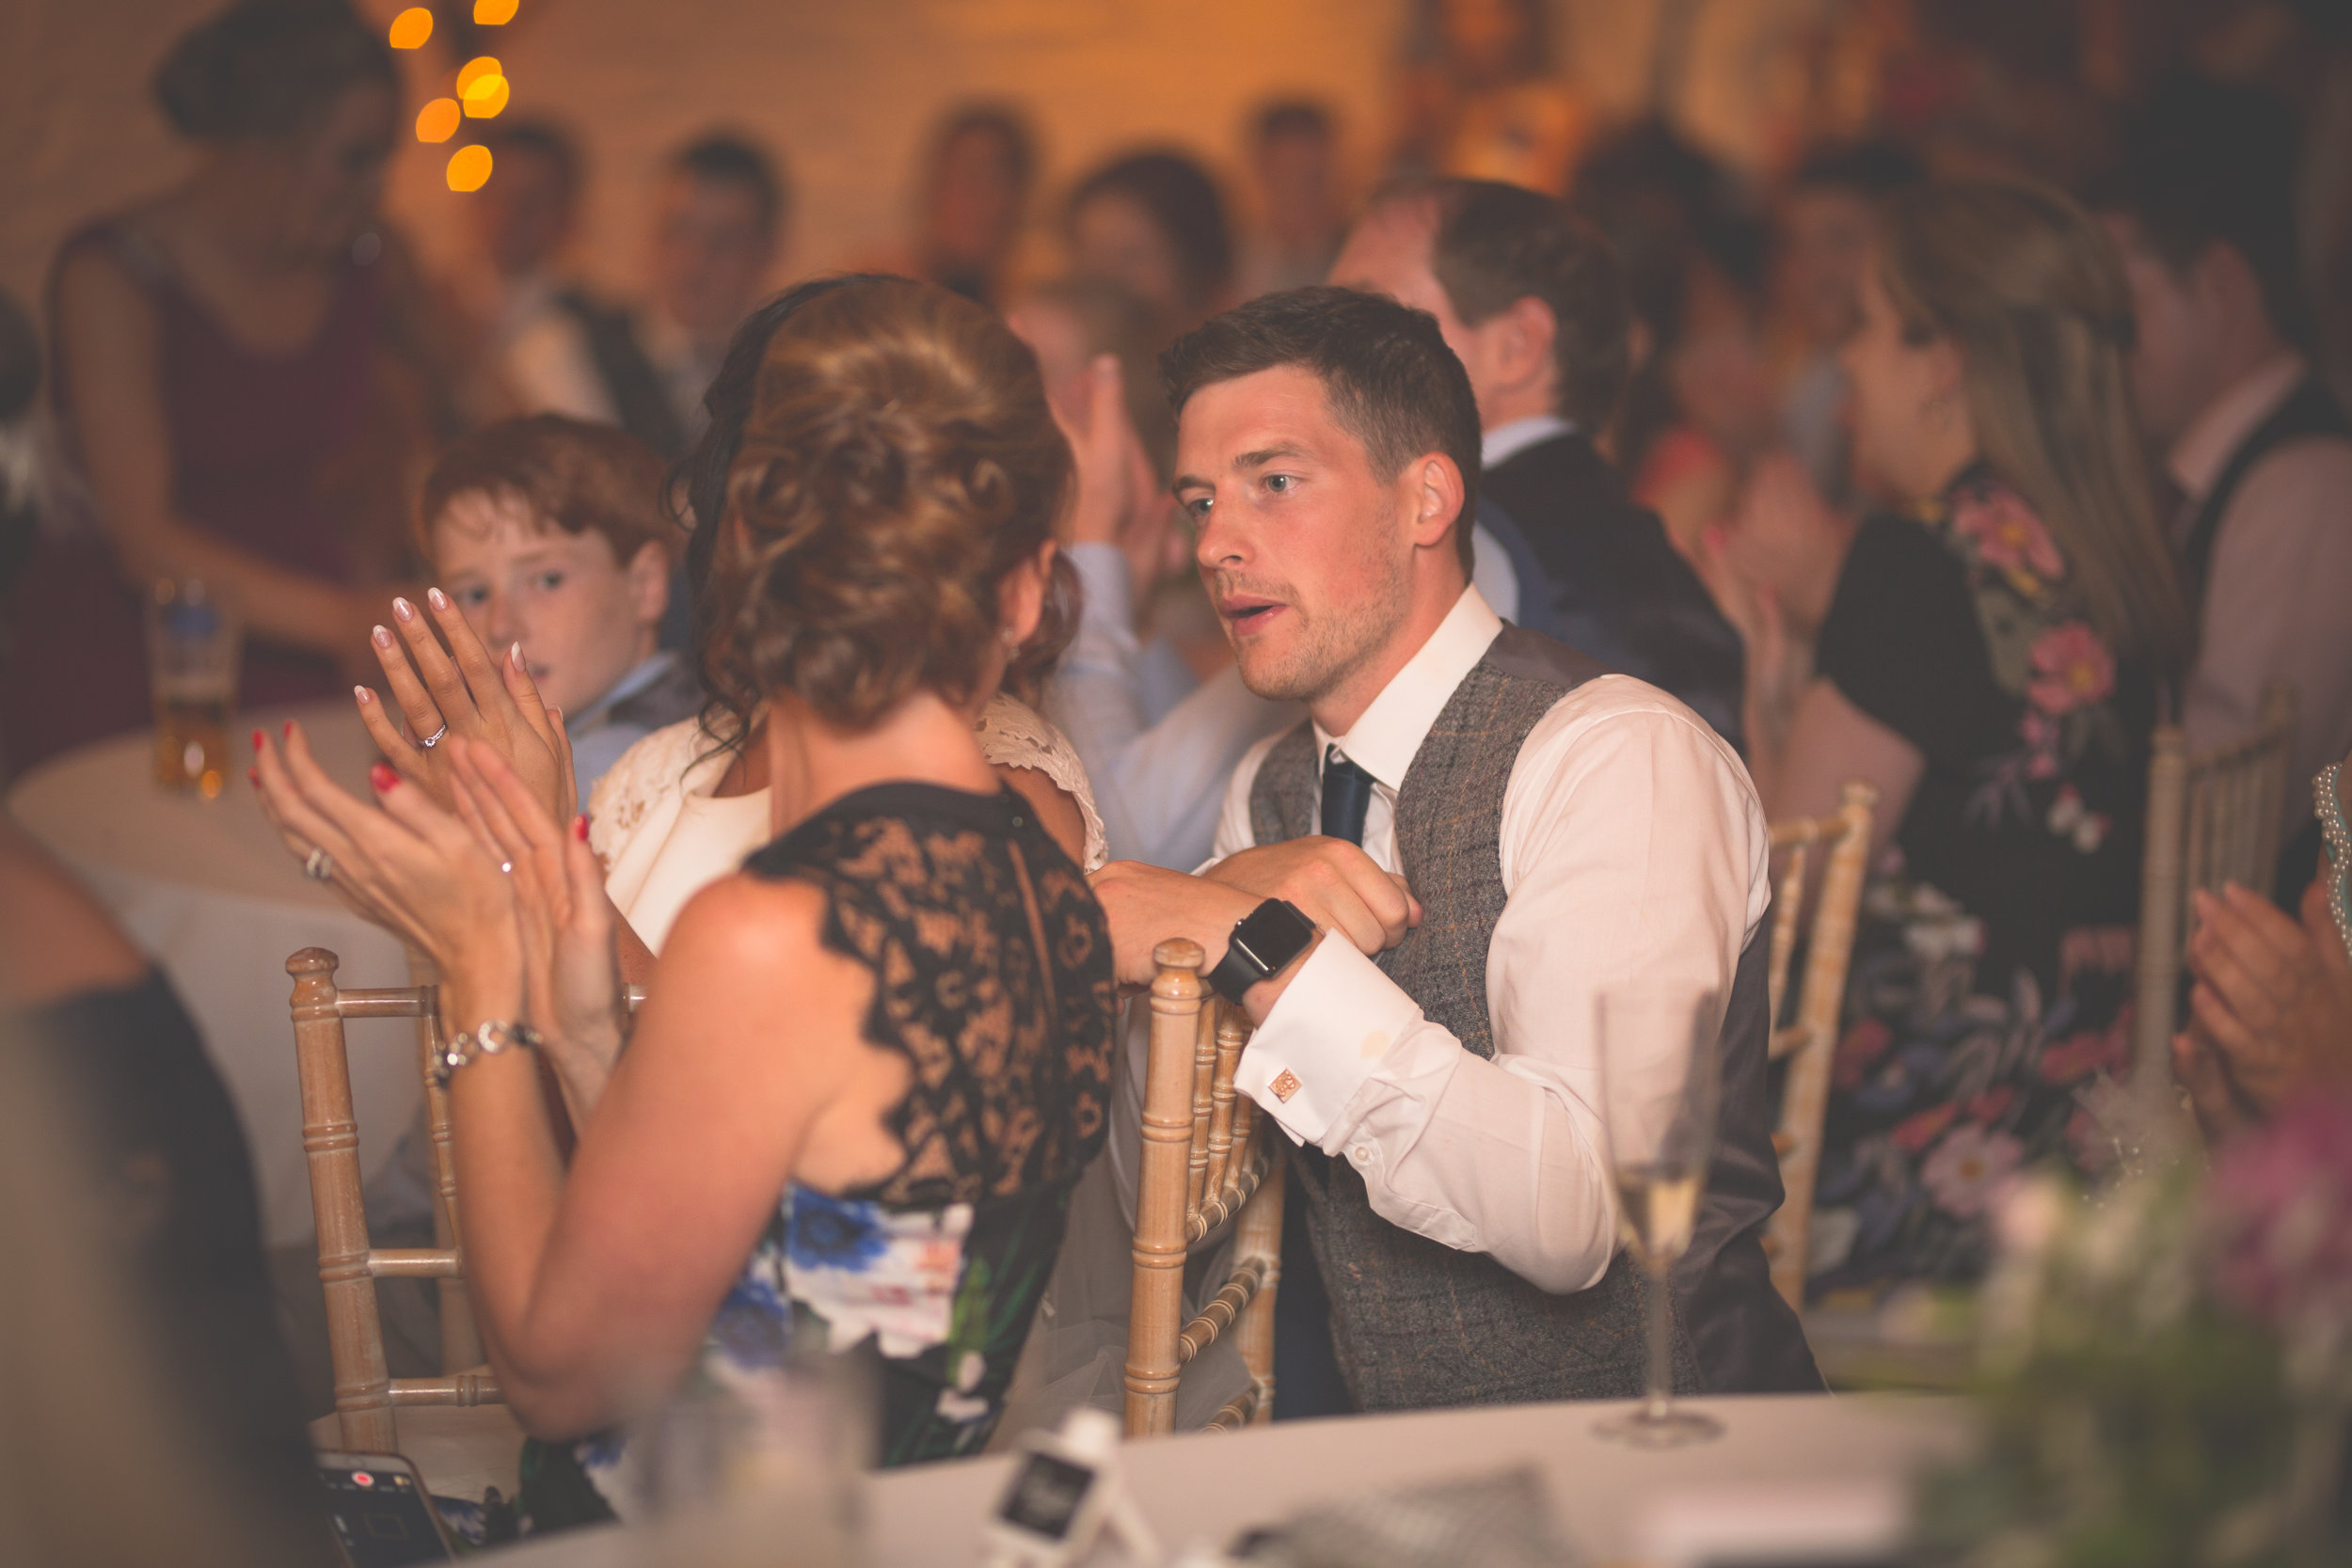 Brian McEwan Wedding Photography | Carol-Annee & Sean | The Dancing-4.jpg